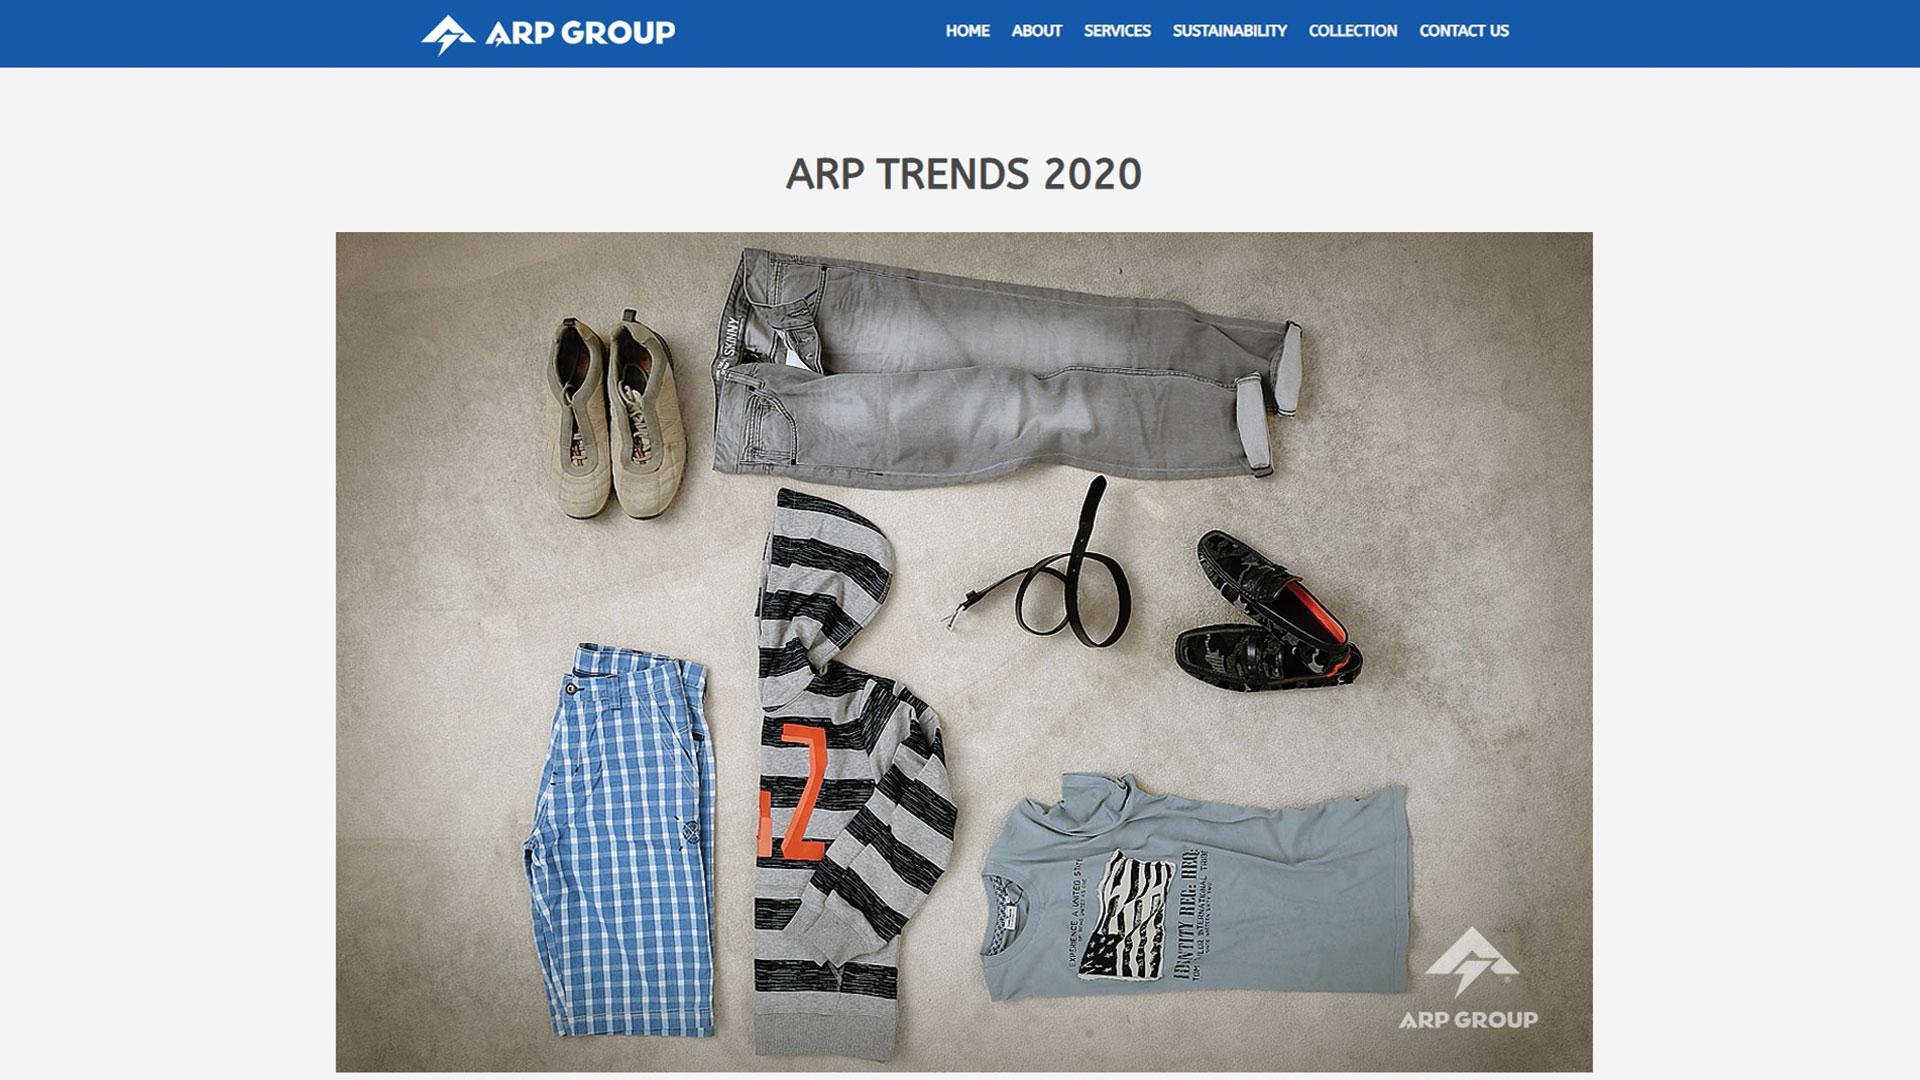 arp-group-Vancouver-web-design-Vancouver-web-development-by-mapleweb-canada-jeans-shoes-pents-image